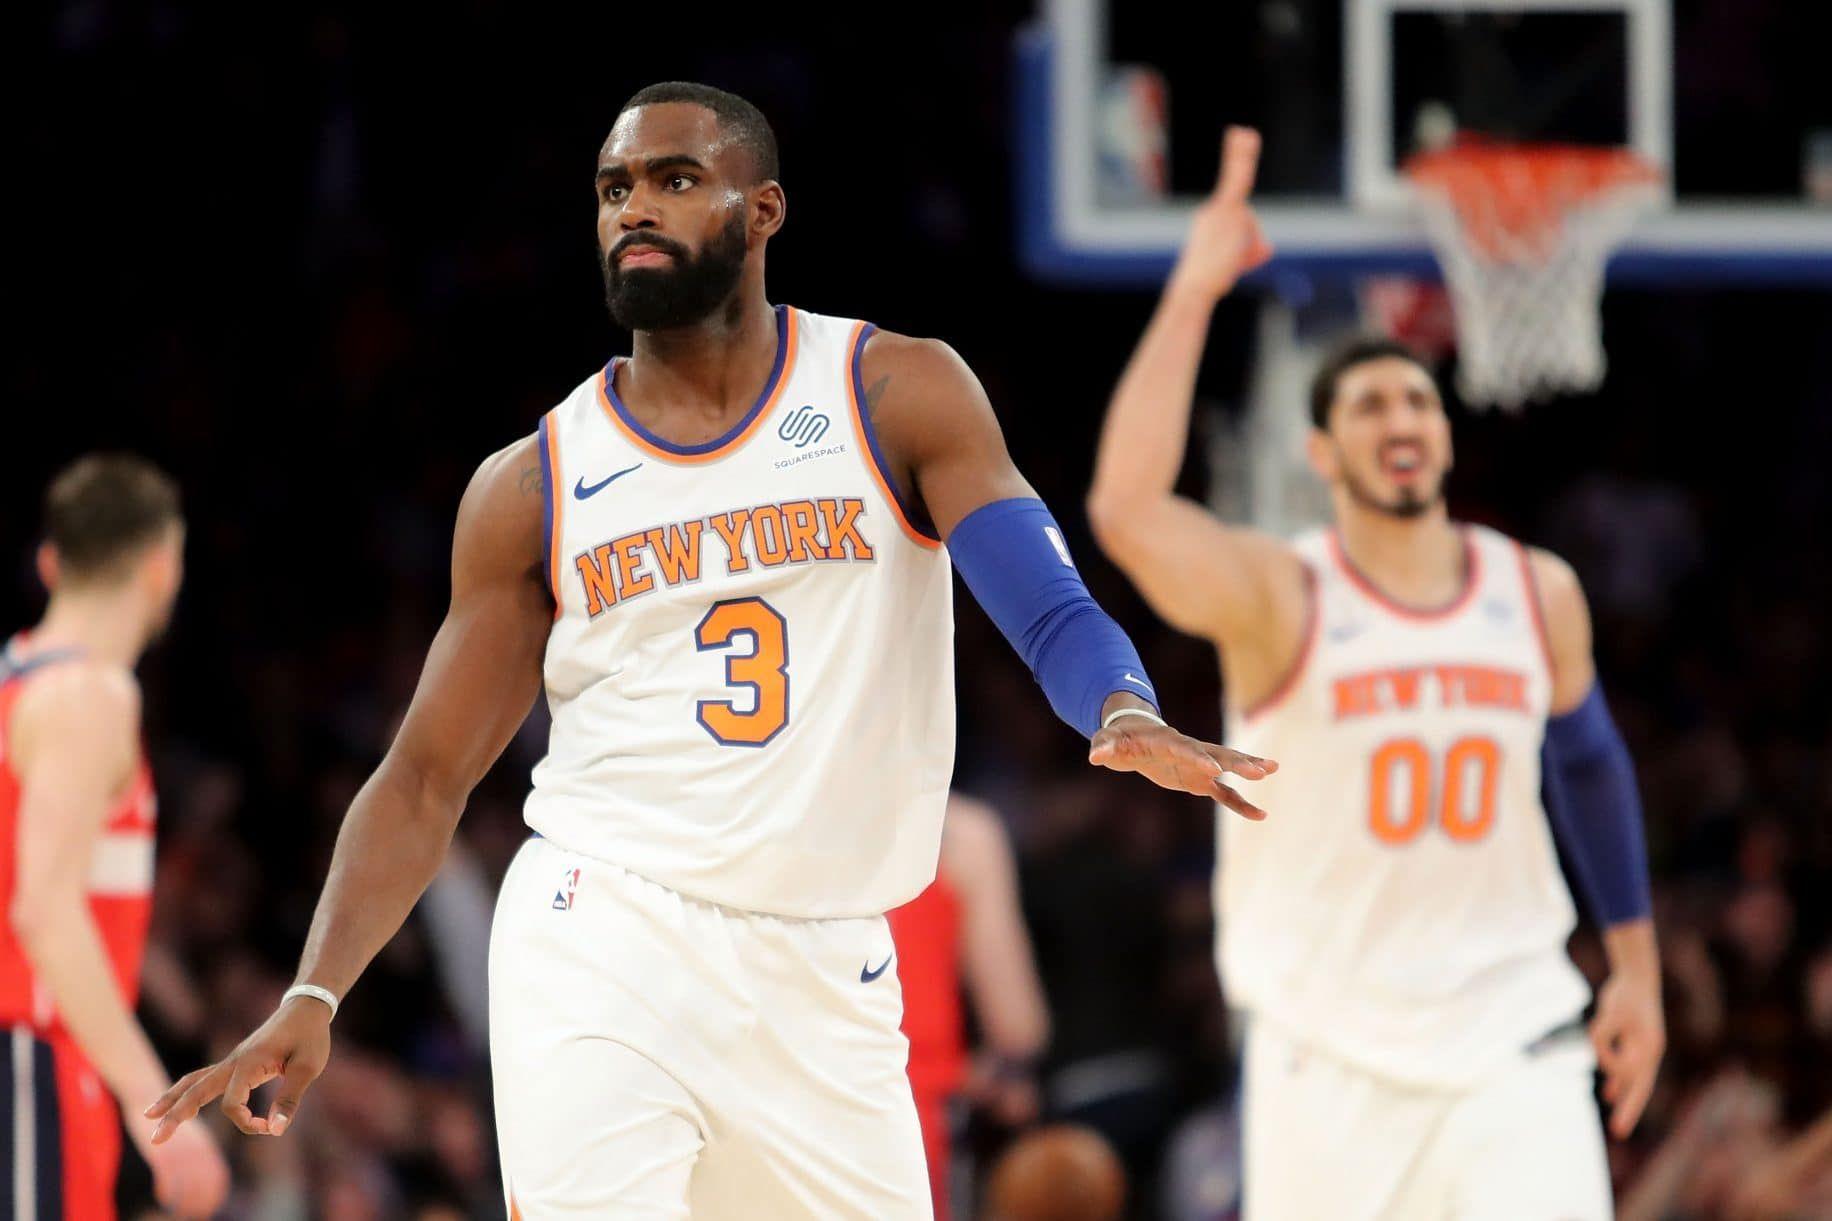 Fans And The Media Alike Are Roasting New York Knicks Swingman Tim Hardaway Jr For His Play So Far In The 2017 18 Sea Tim Hardaway New York Knicks Million Men